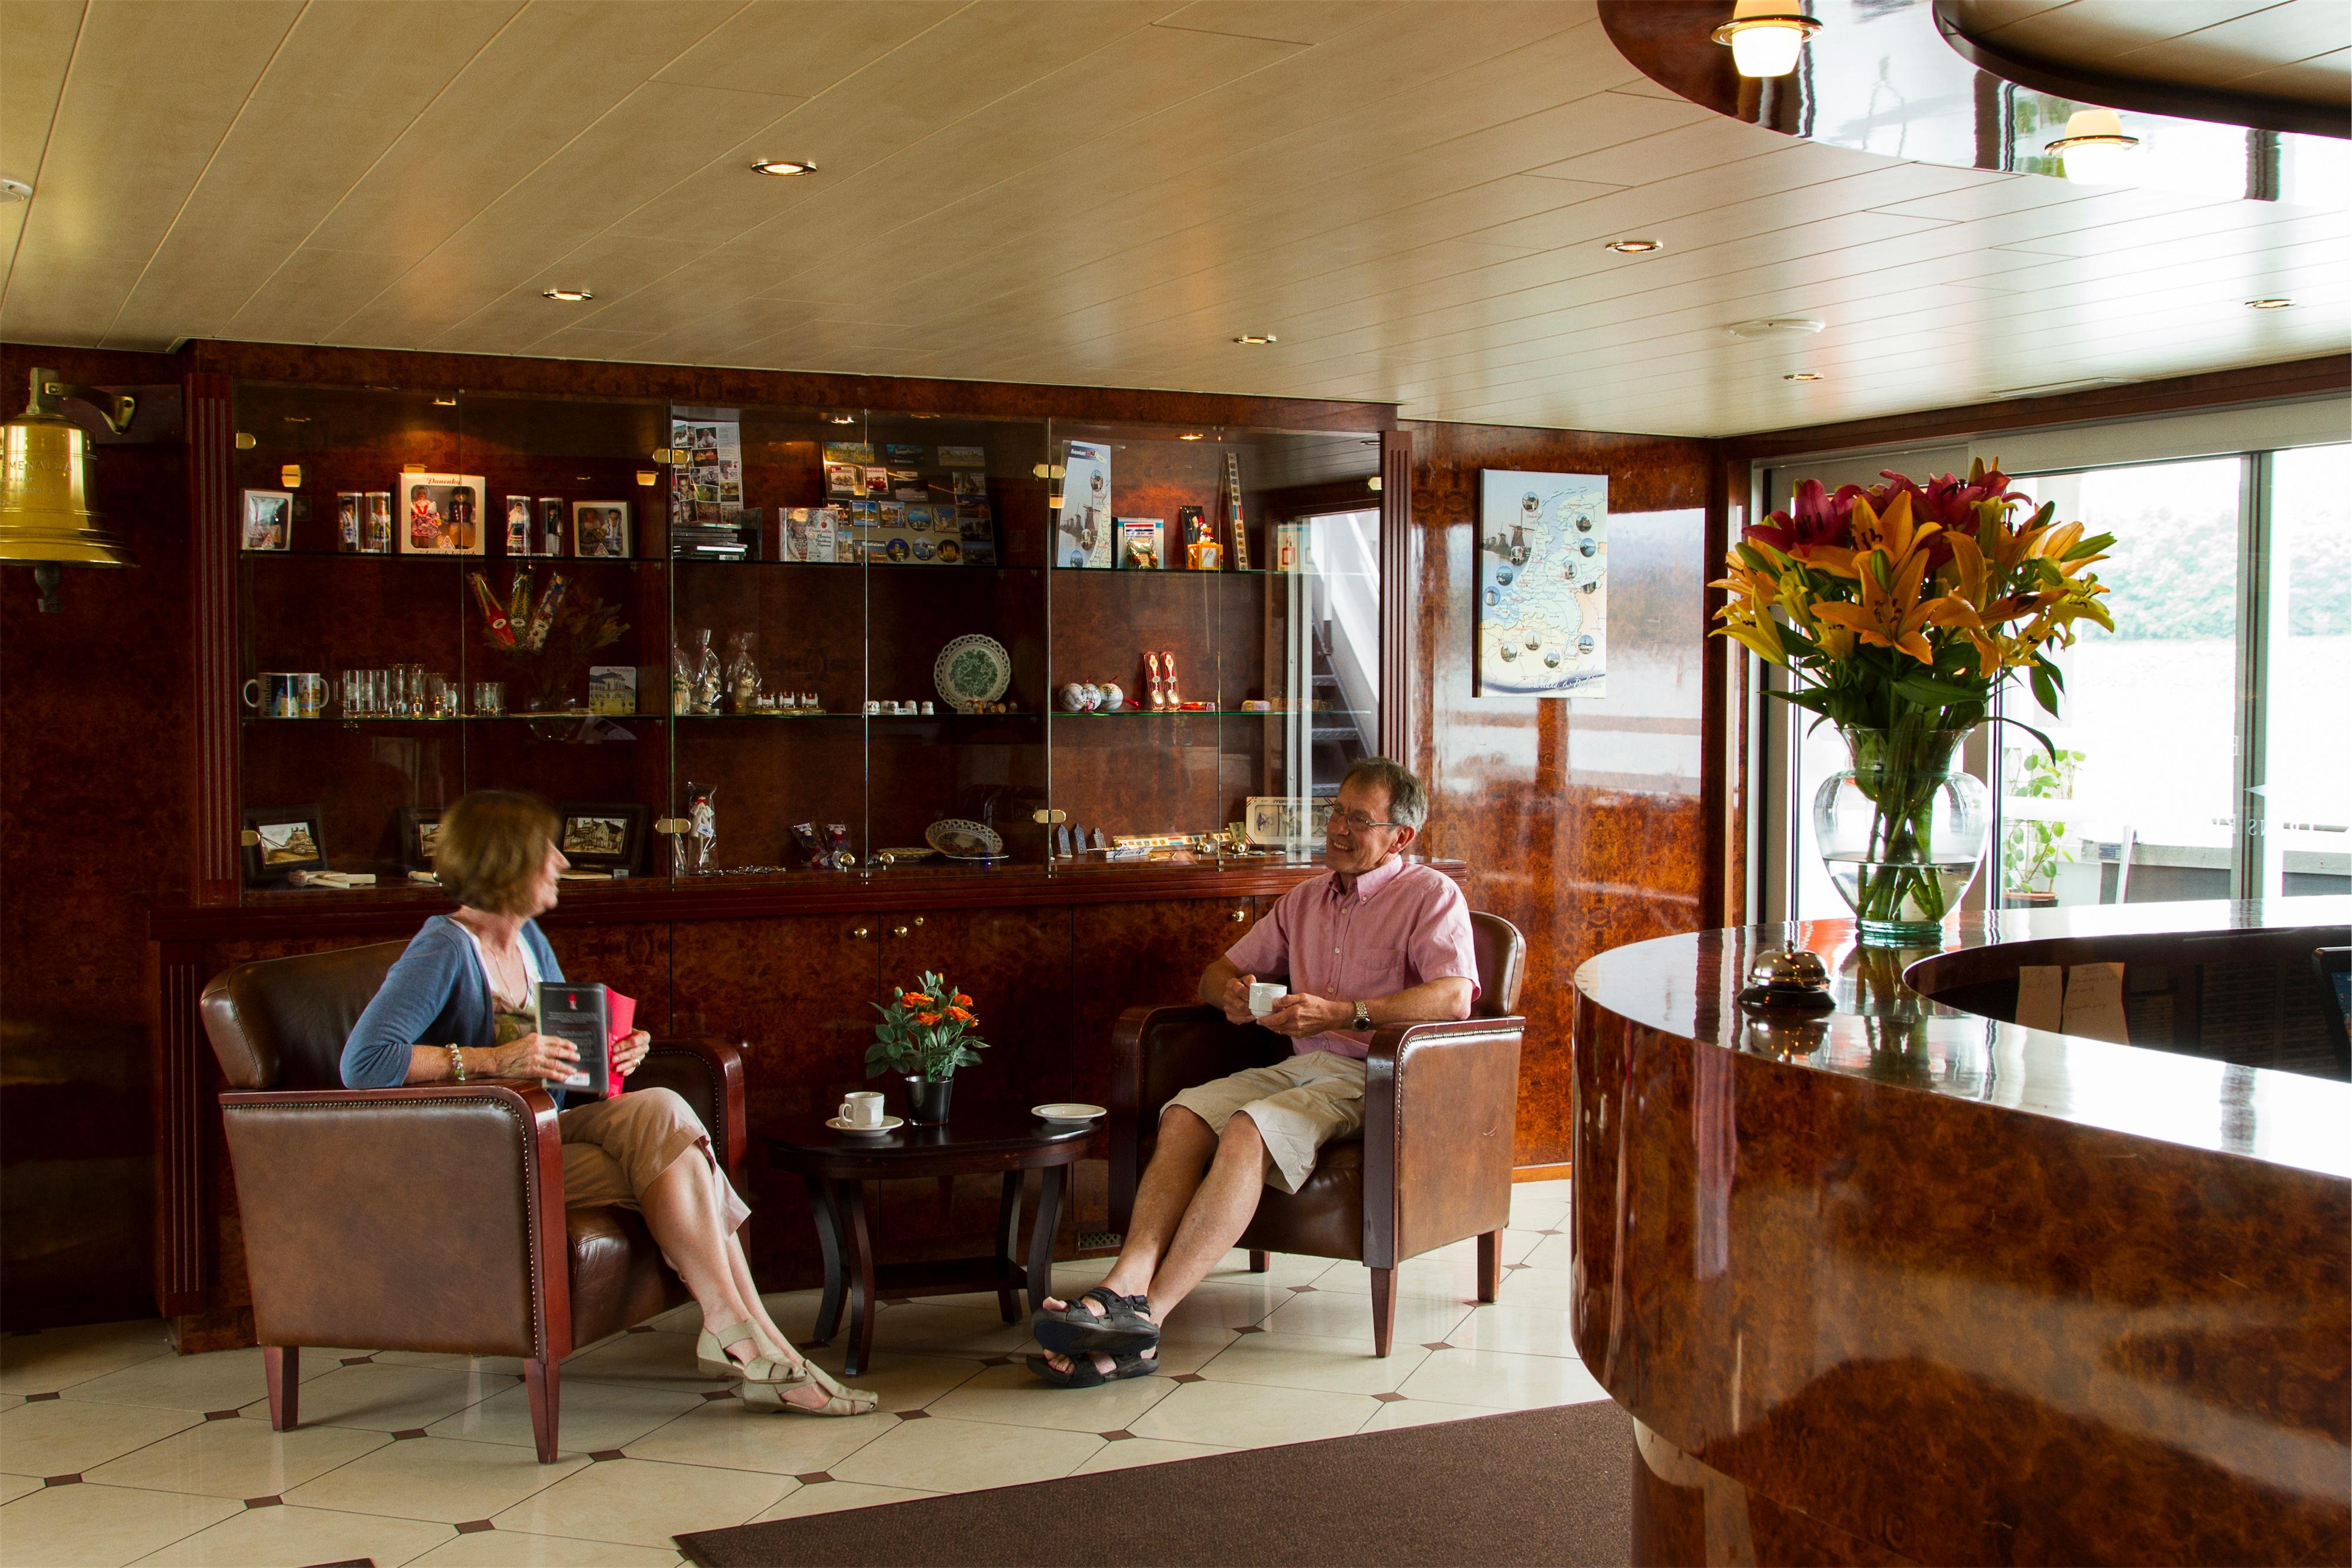 Shearings MV Esmeralda Interior Lounge Bar.jpg